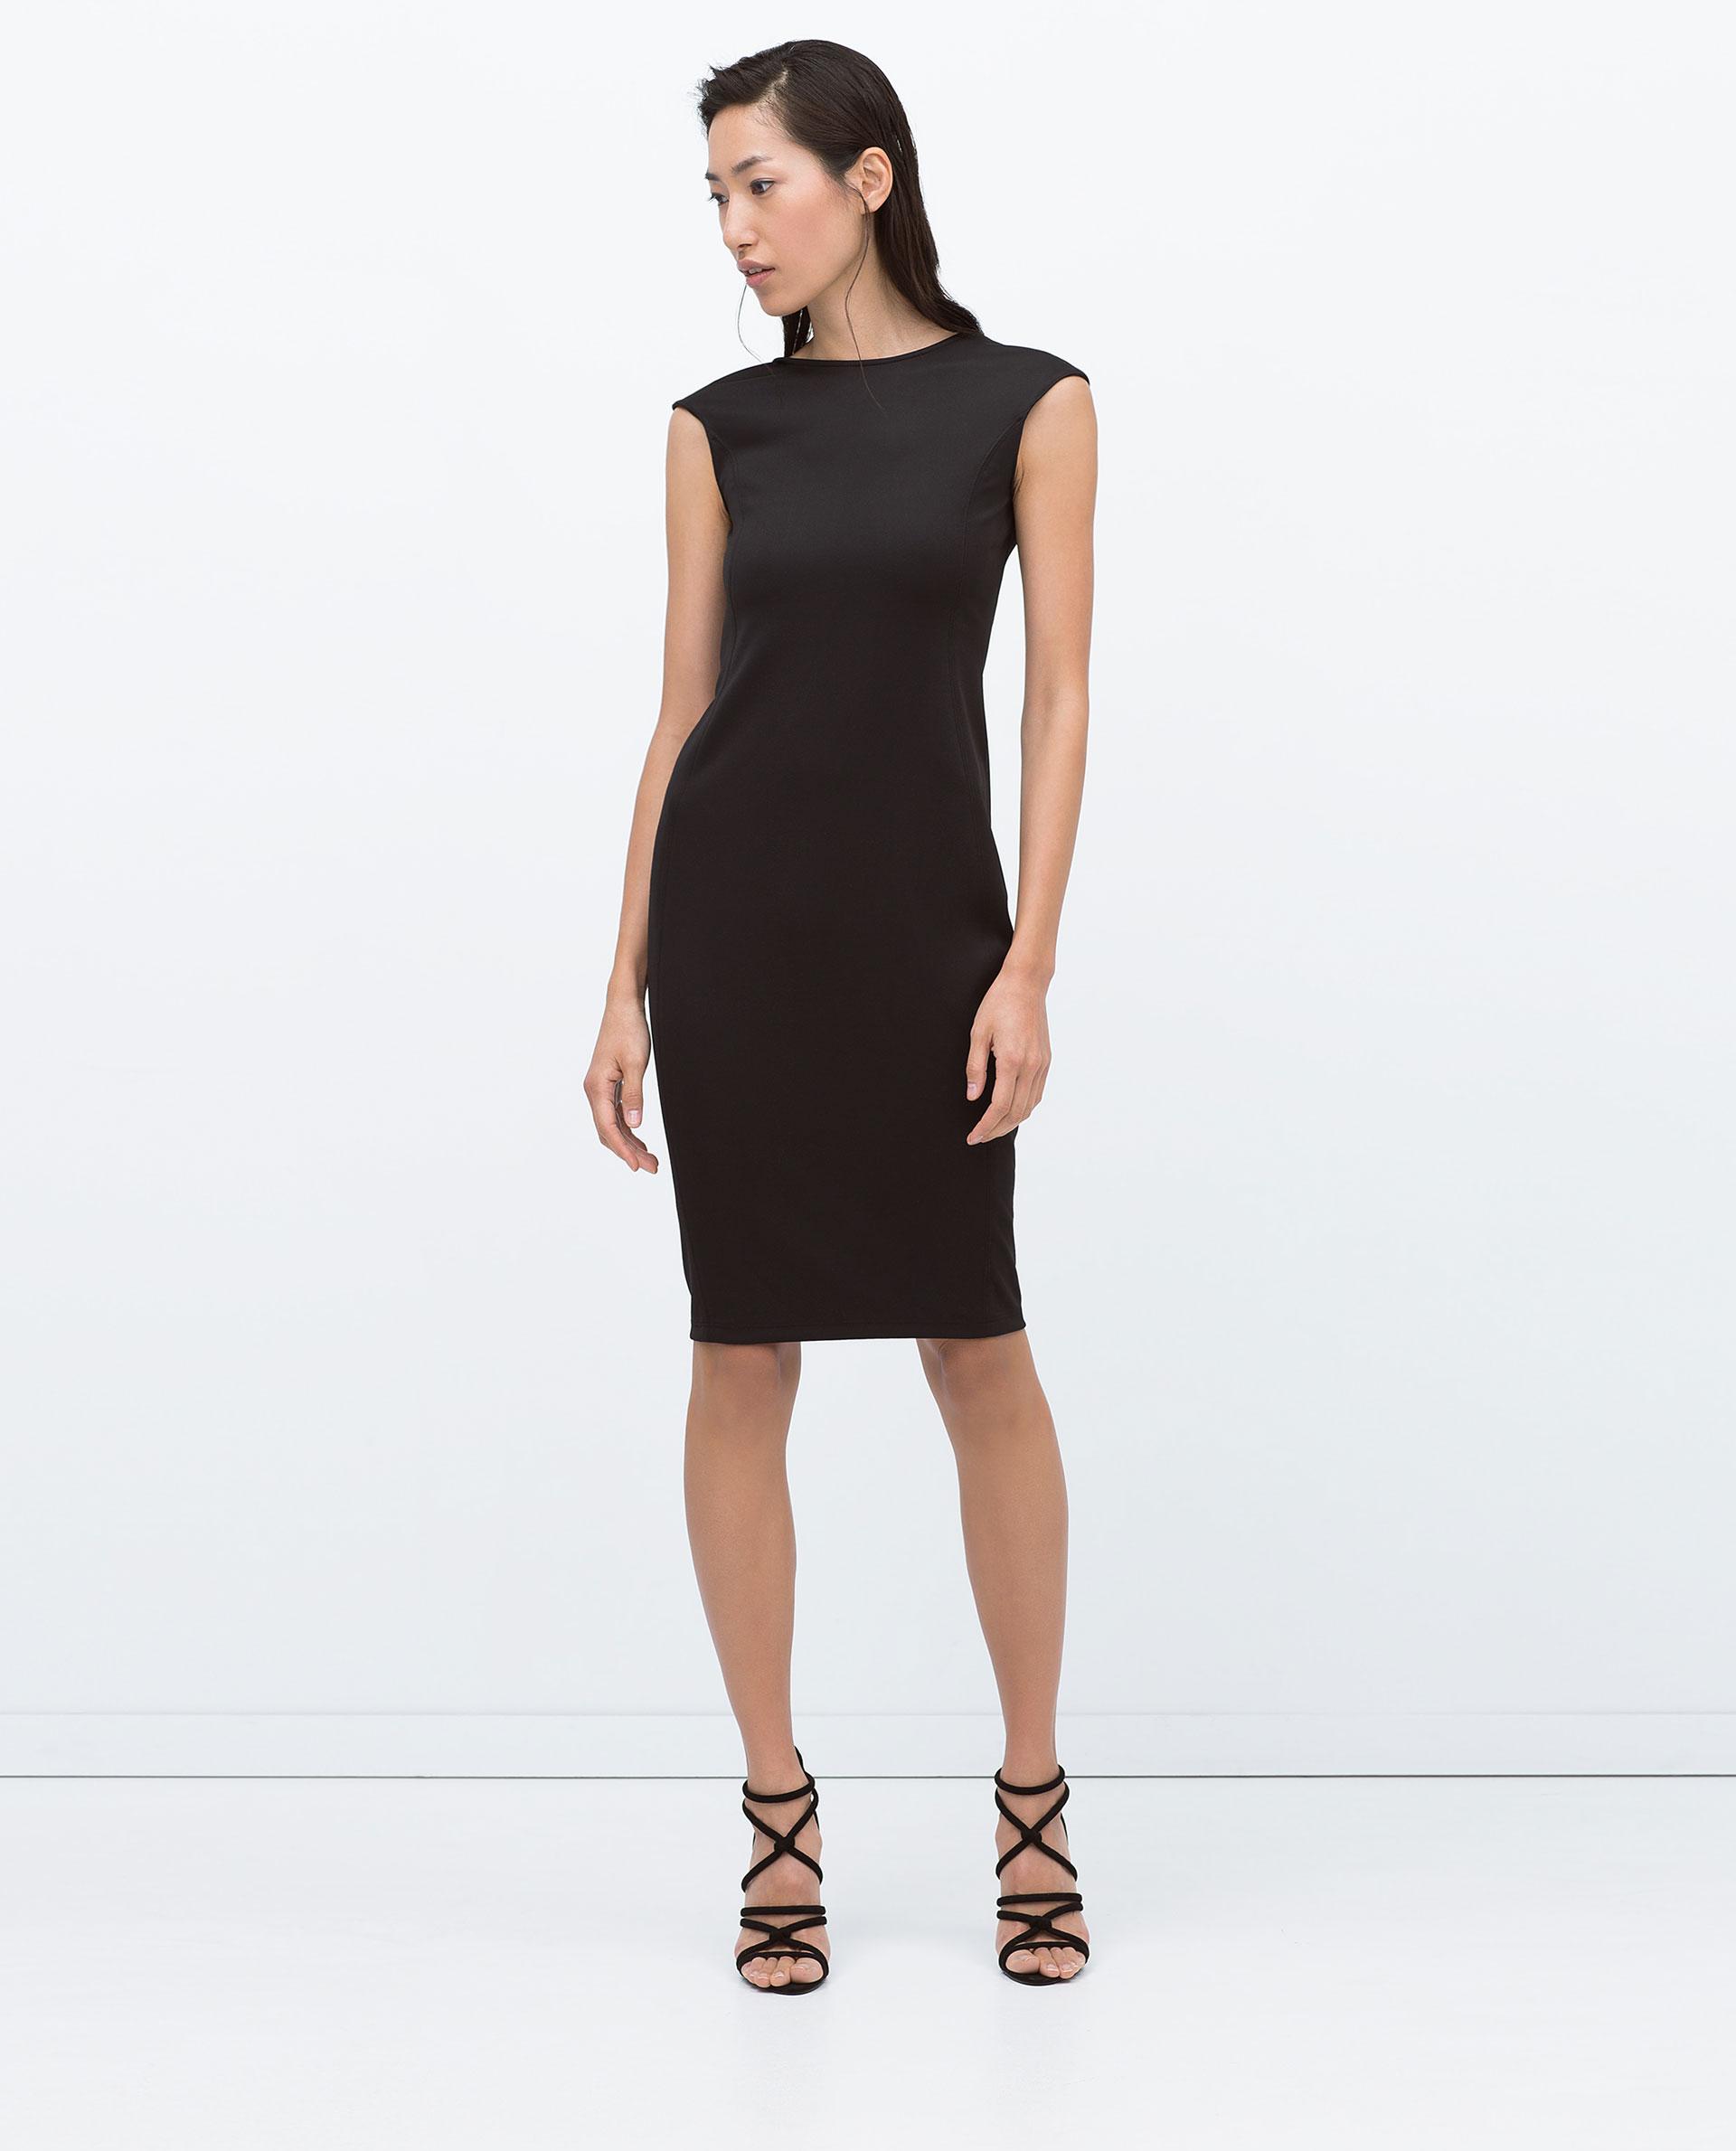 Zara Mid-Length Tailored Dress in Black | Lyst